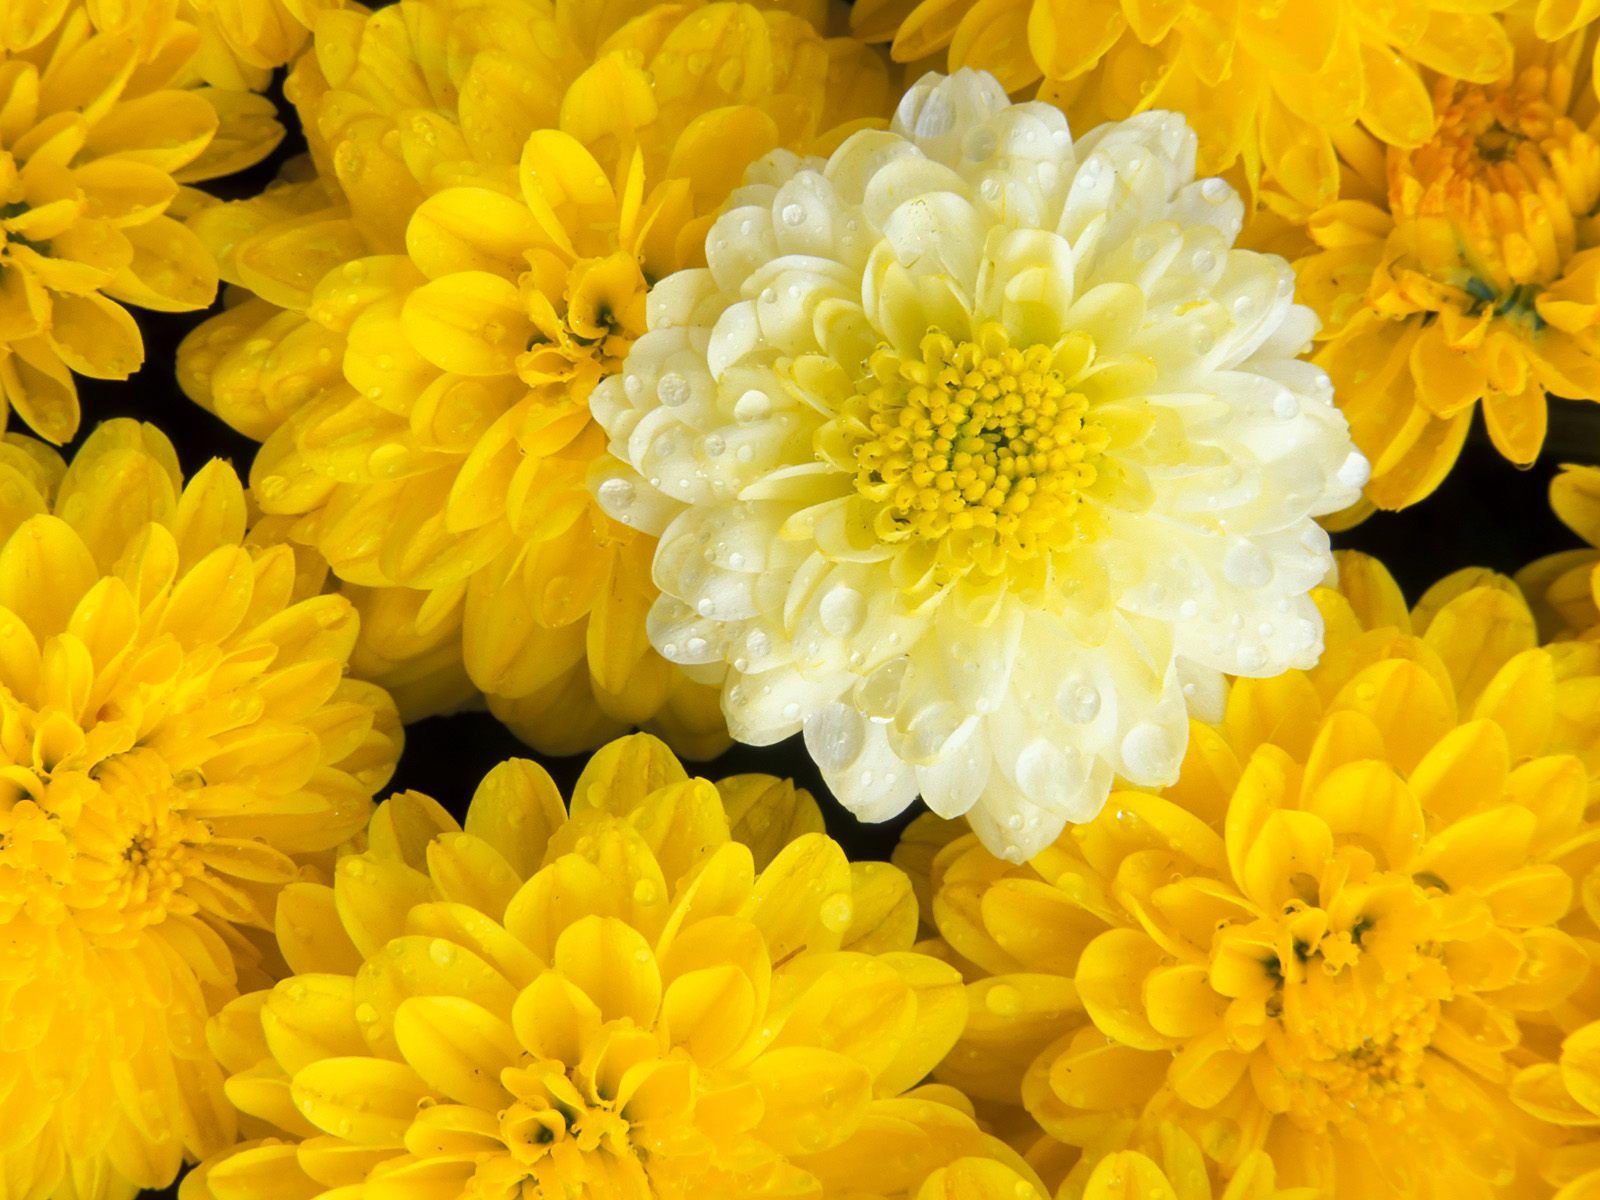 Chrysanthemum Symbolism